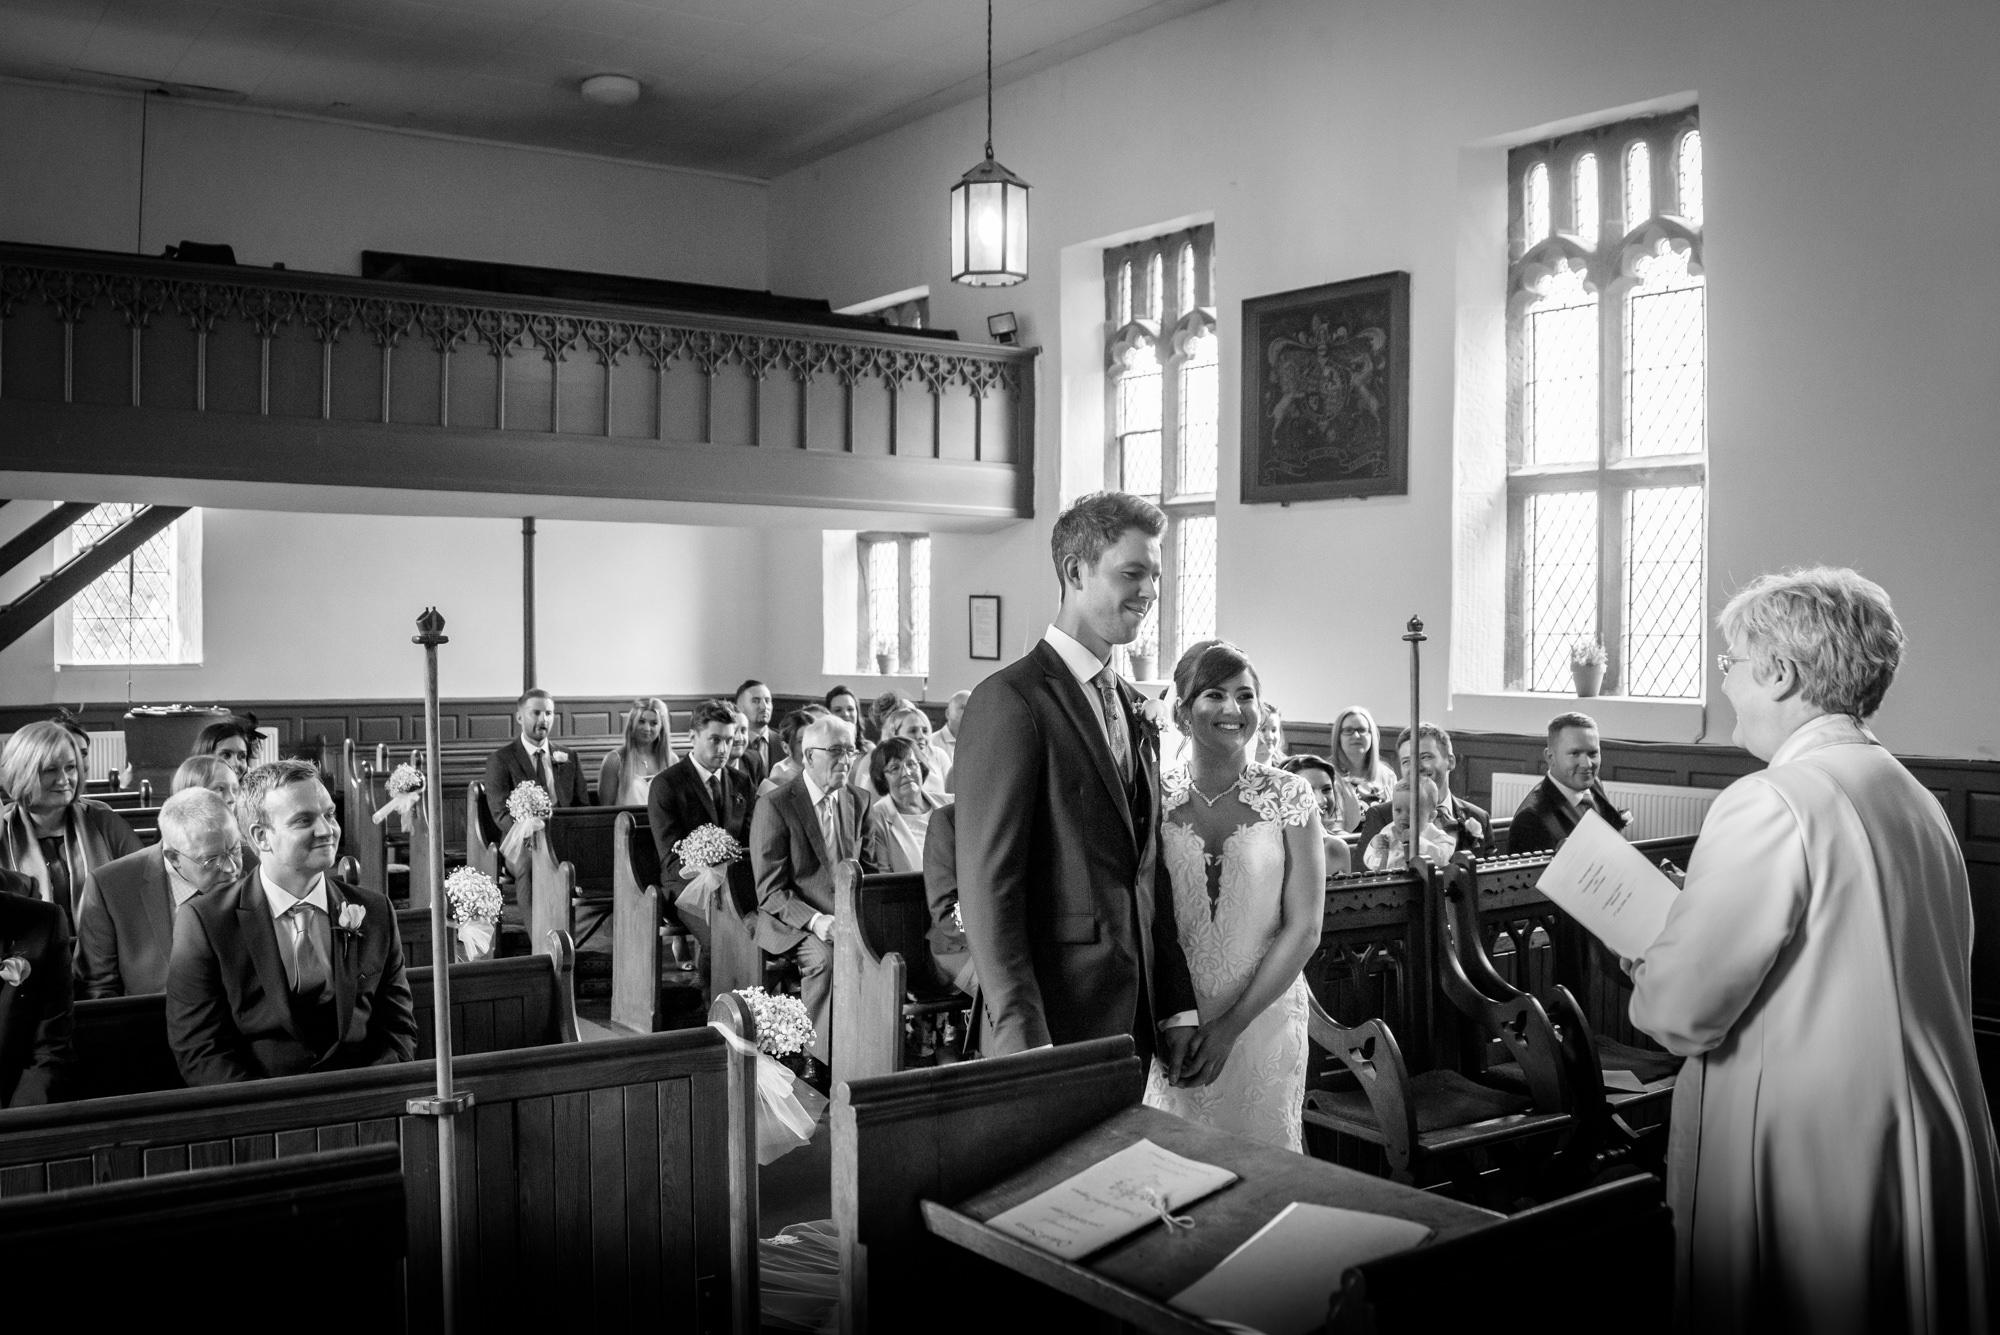 Wedding ceremony at the Parish Church of Saint Michael Whitewell